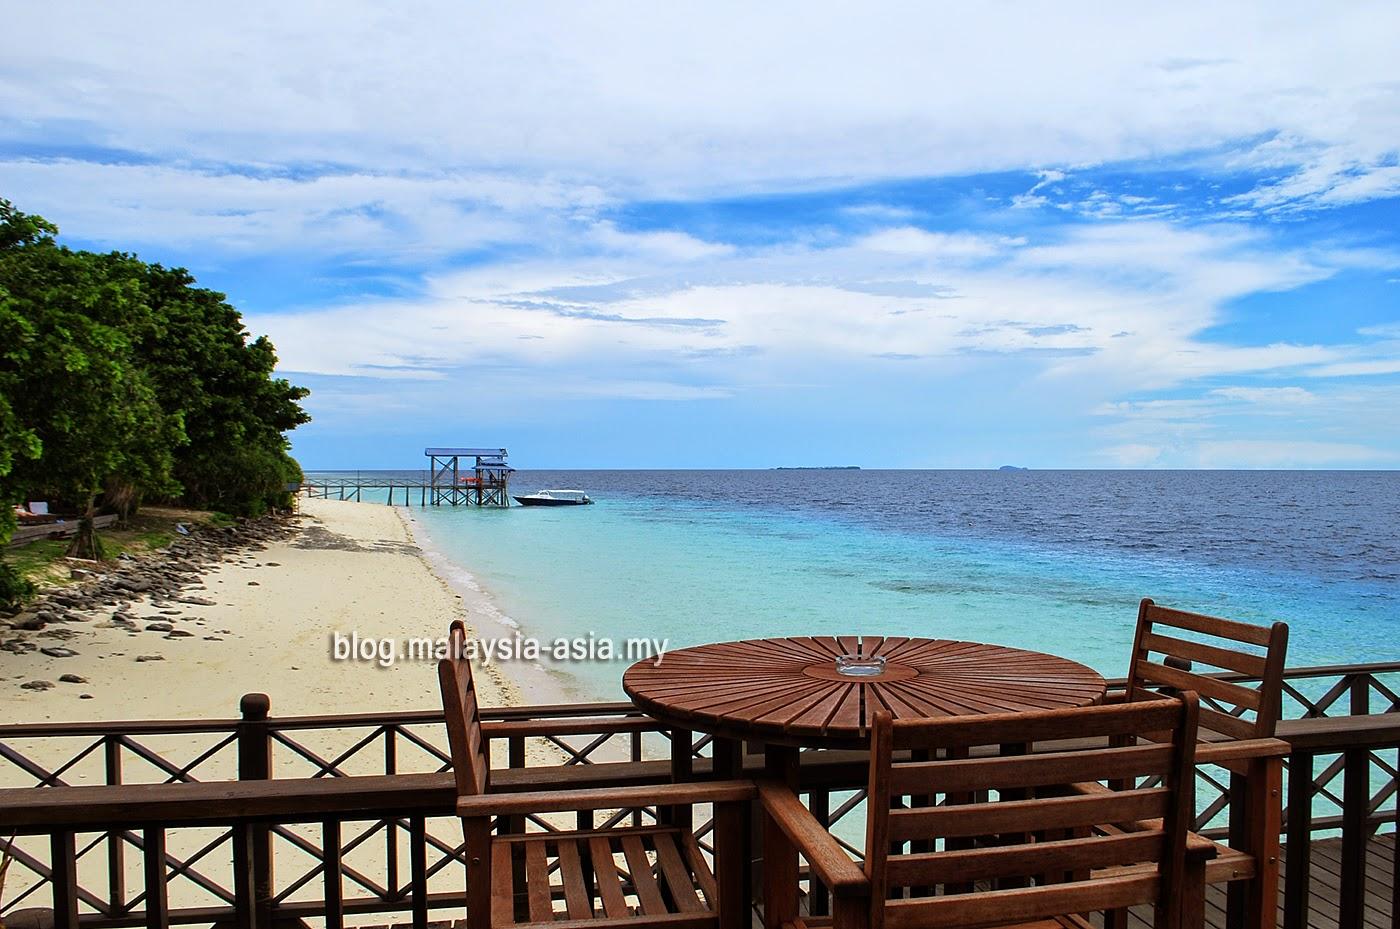 Beach at Mataking island